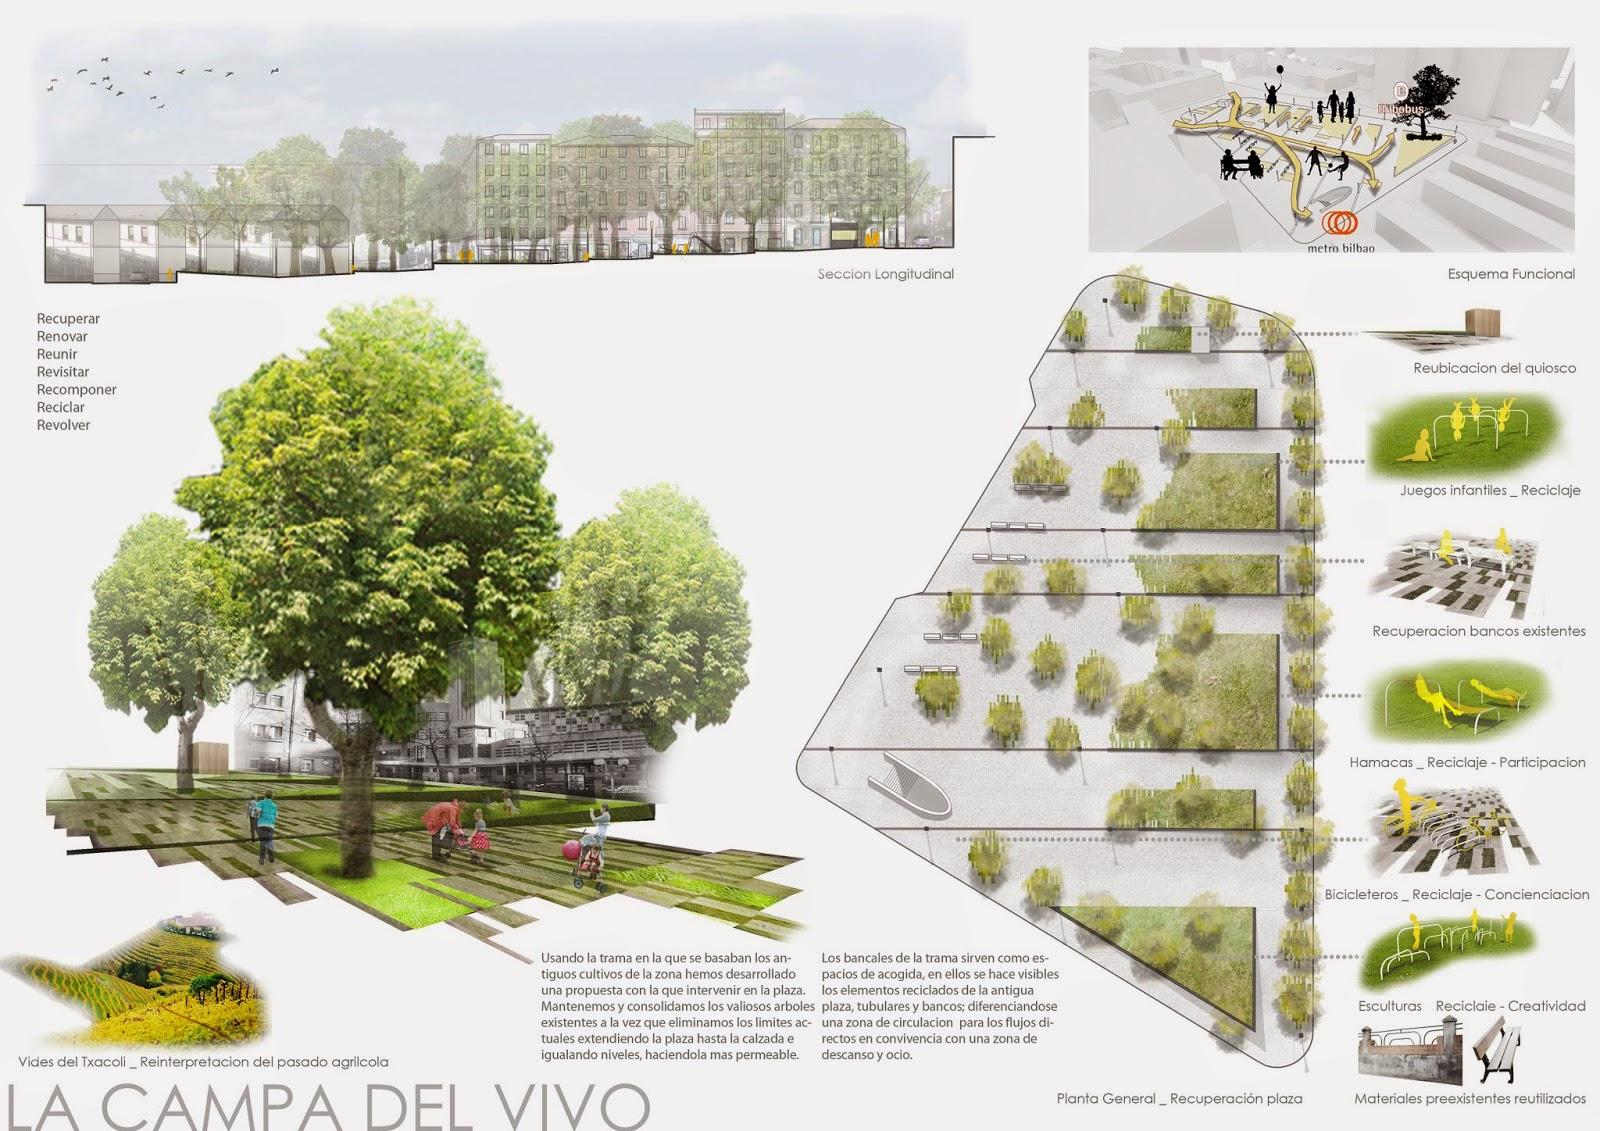 andres gonzalez gil espacio publico renovacion plaza public space square renovation santutxu bilbao txokoak 2013 01